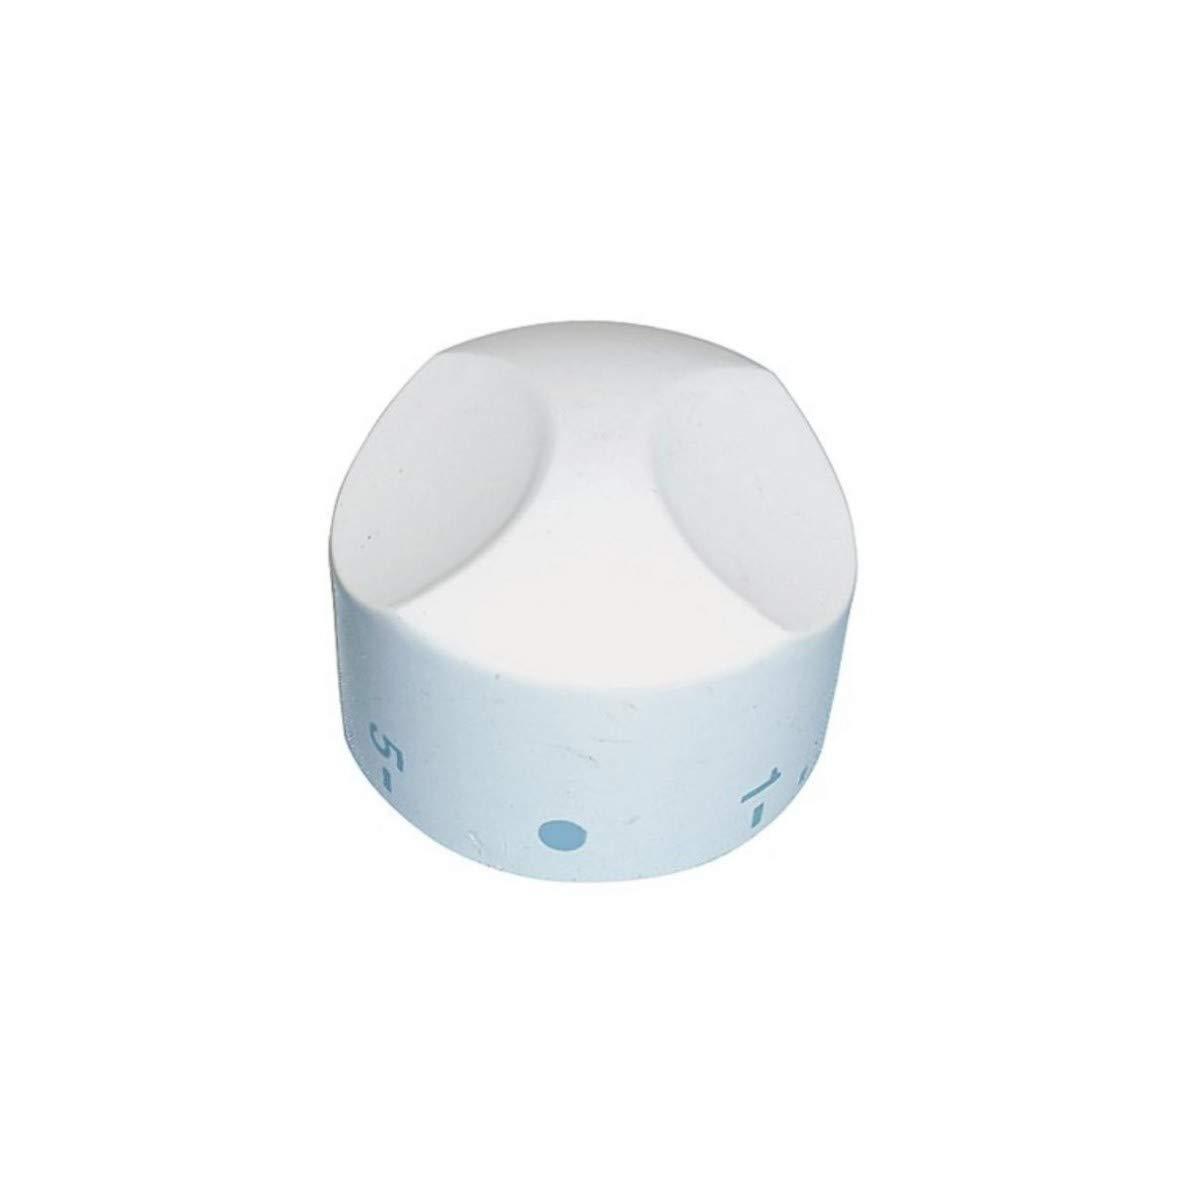 Recamania Mando termostato frigorifico Indesit CG1183UK GD290 ...